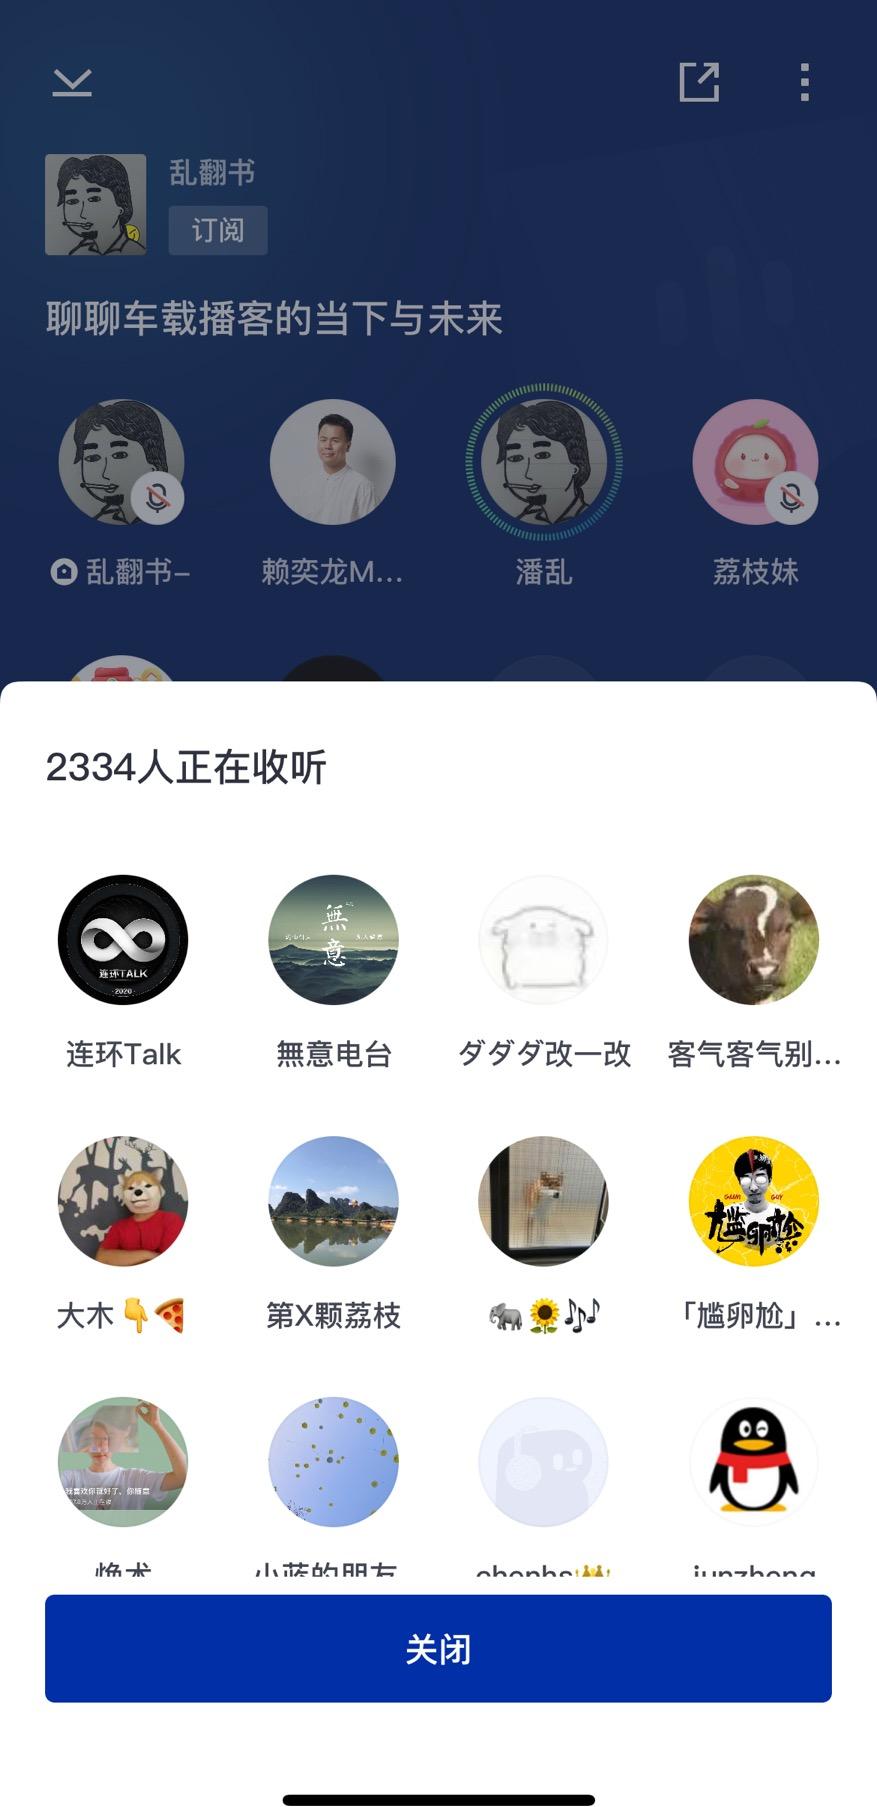 http://www.k2summit.cn/tiyujingsai/3376766.html